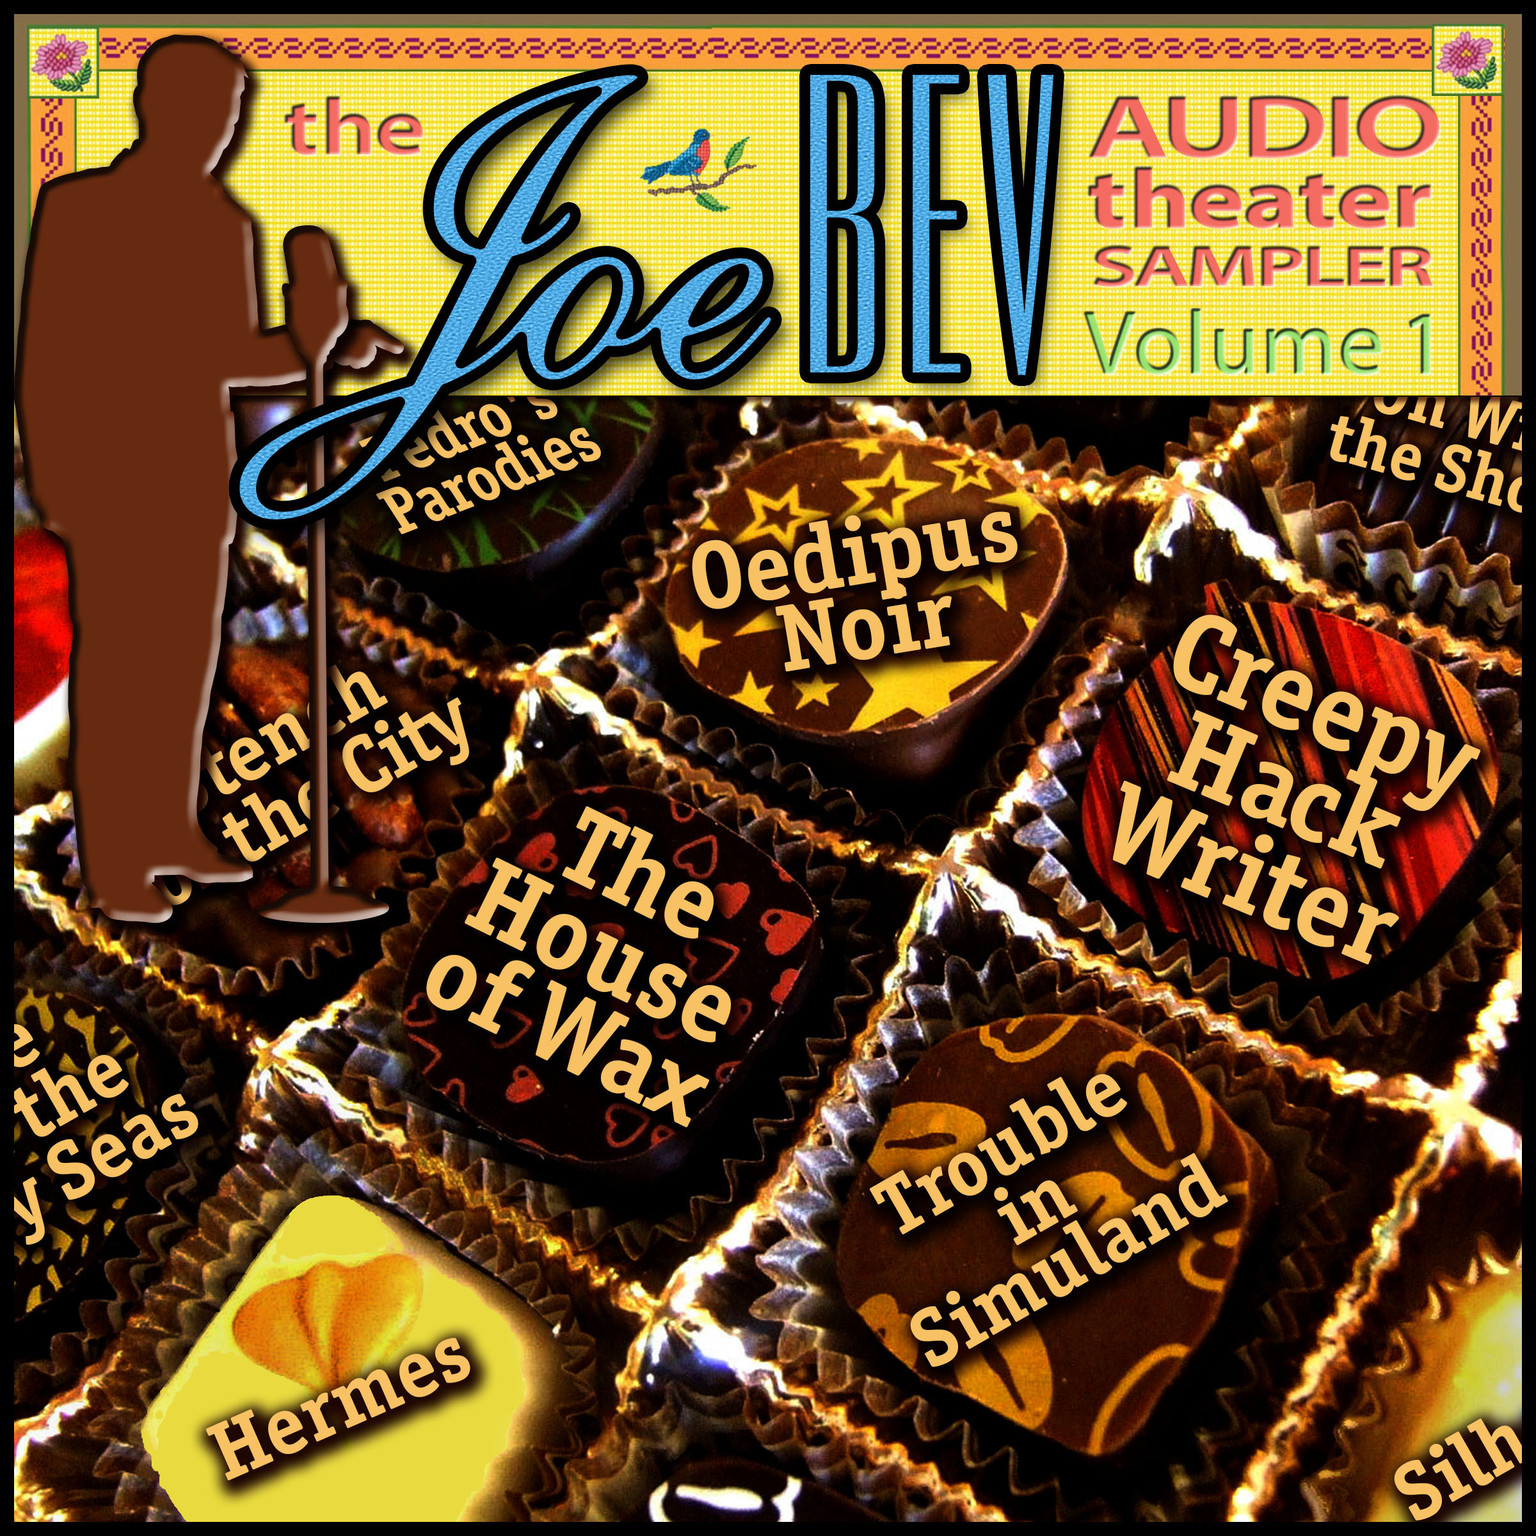 Printable A Joe Bev Audio Theater Sampler, Vol. 1 Audiobook Cover Art